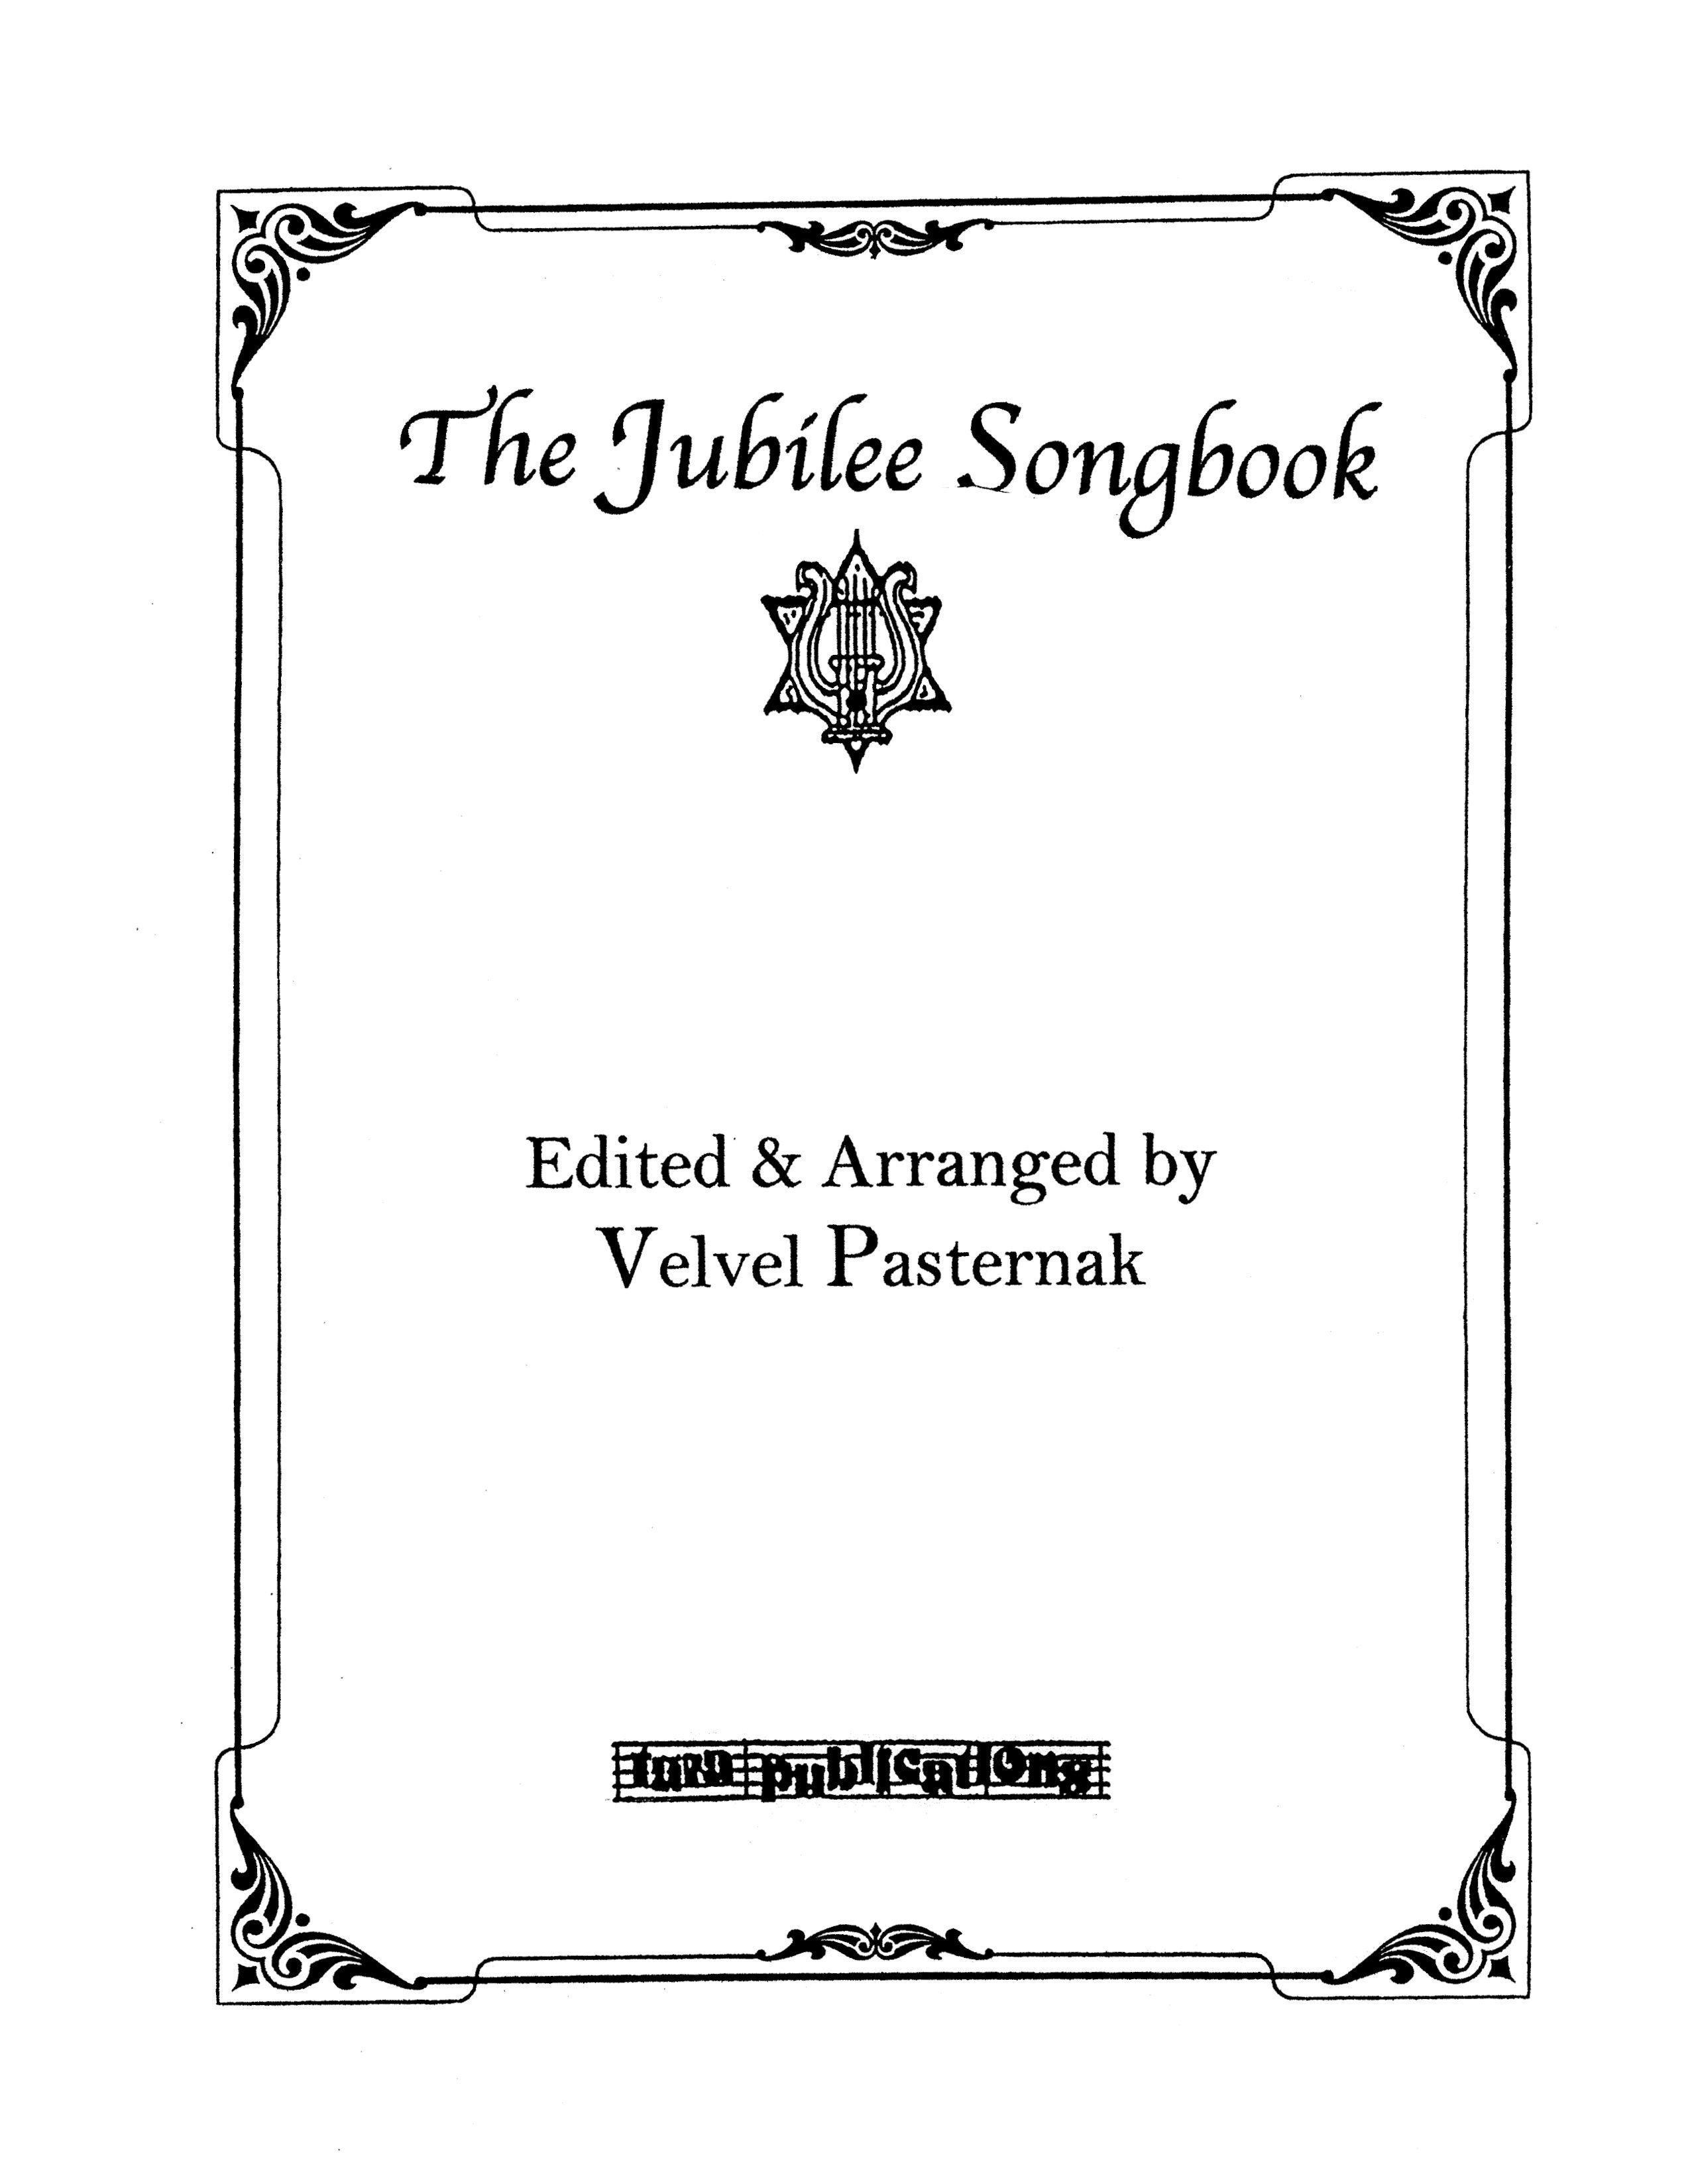 The Jubilee Songbook